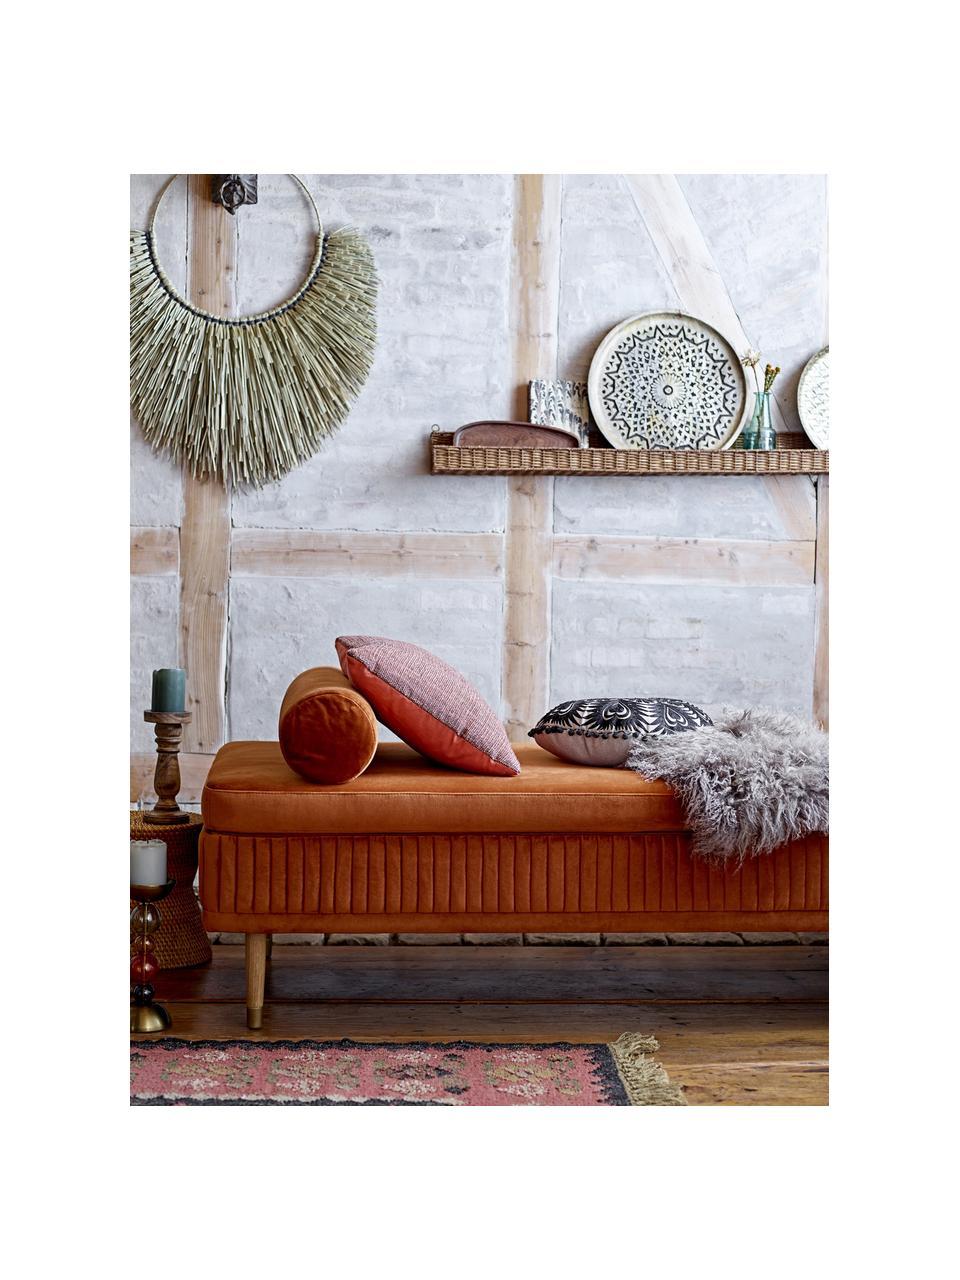 Fluwelen daybed Hailey in roestbruin met eikenhouten poten, Bekleding: polyester fluweel, Poten: eikenhout, metaal, Fluweel roestbruin, B 190 x D 80 cm